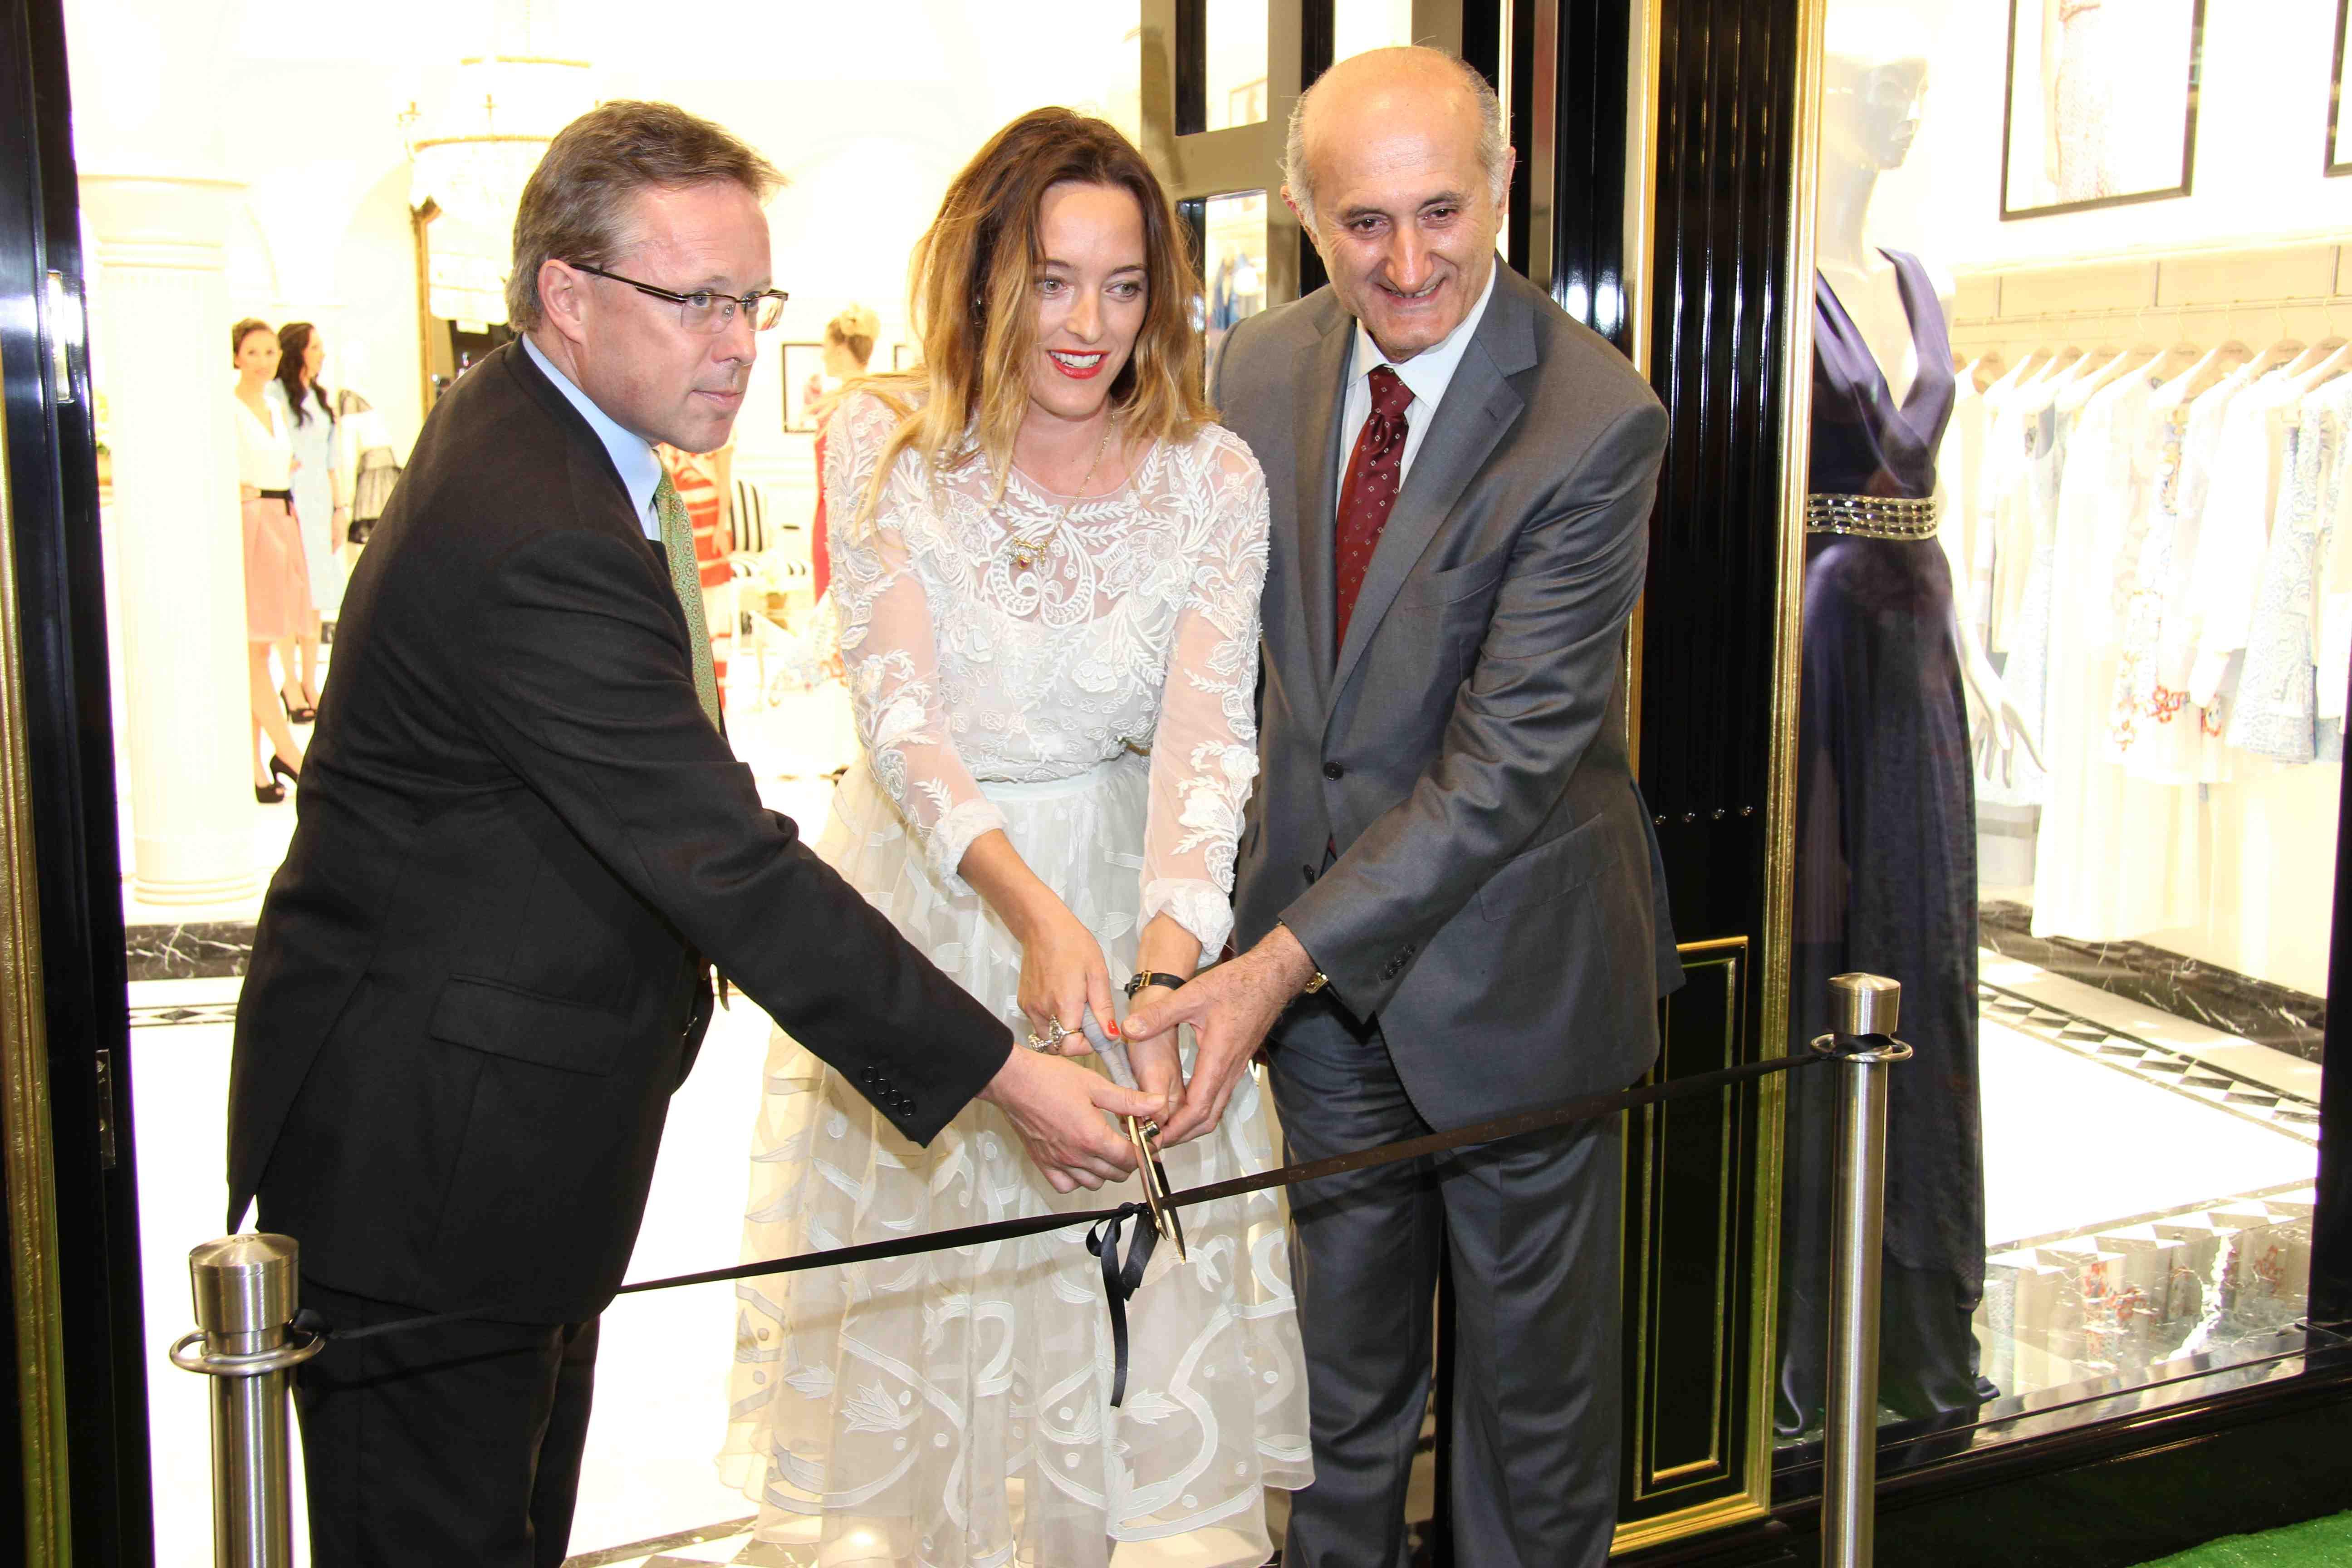 3. Michael O'Neill (uk ambassador) Alice Temperley & Issa Abu Issa (CEO and Chairman)